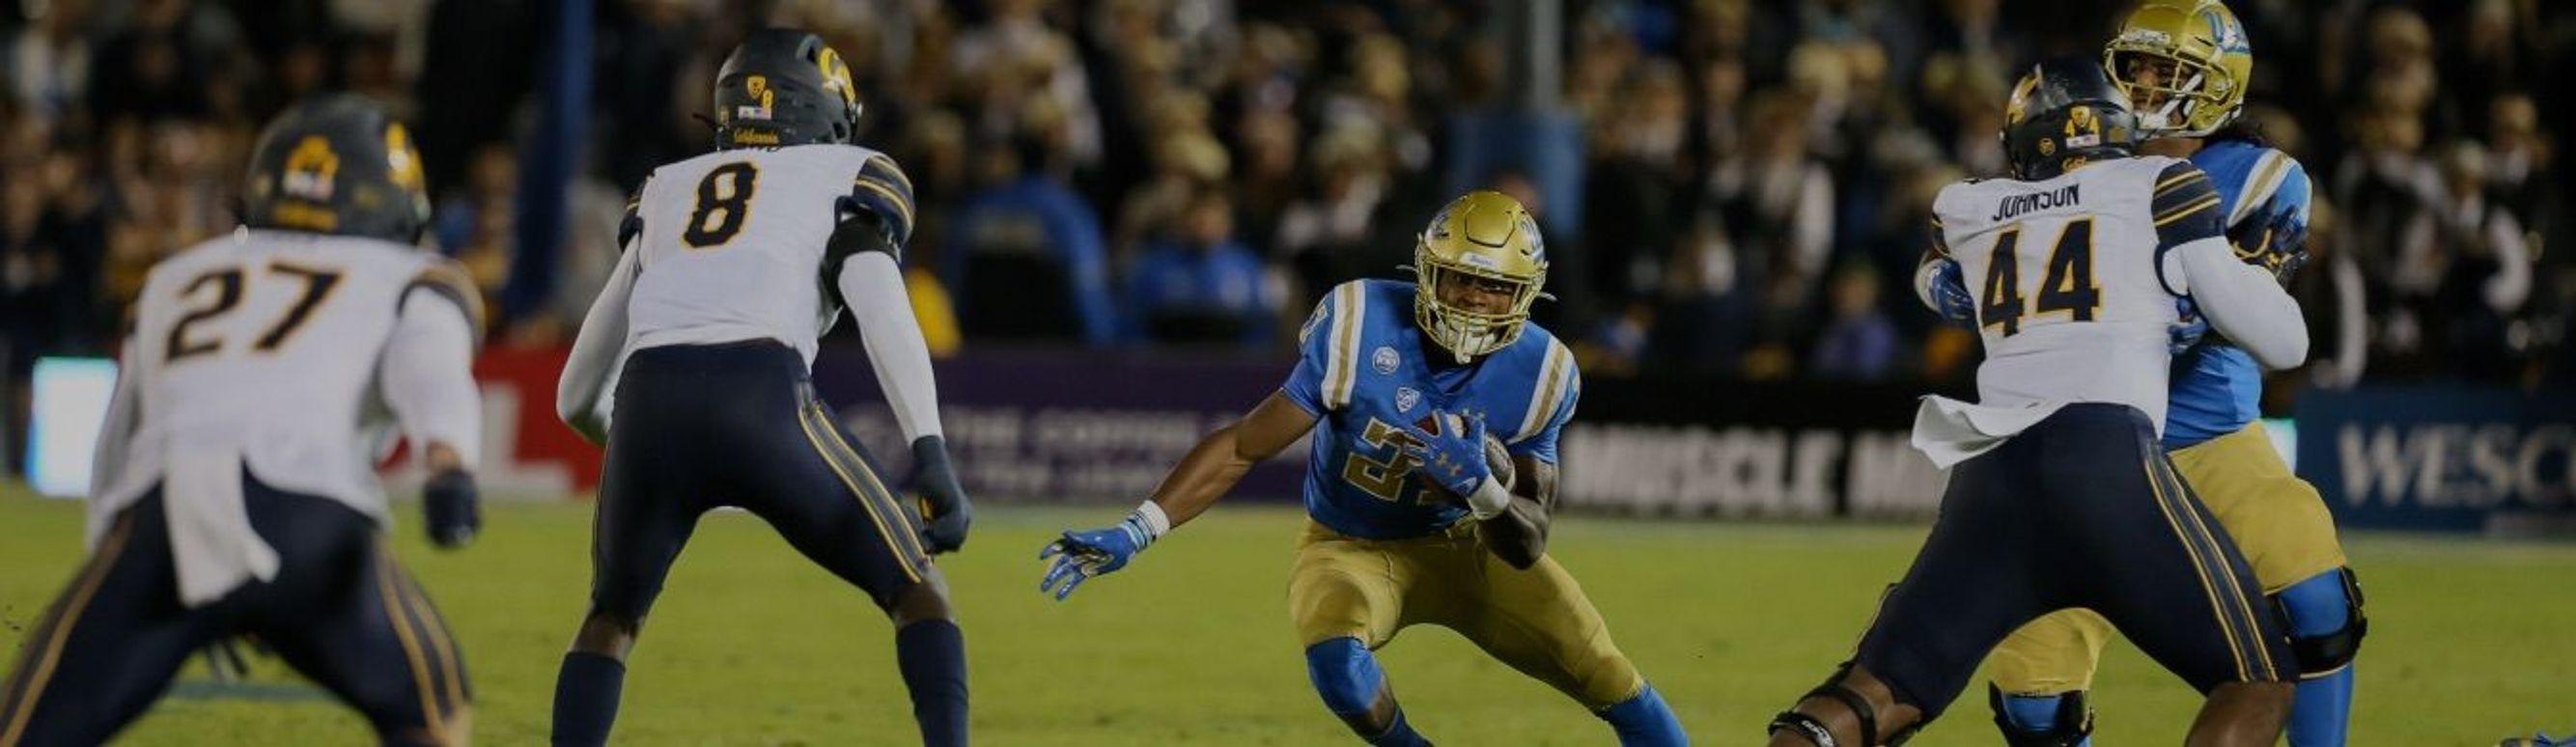 UCLA runs the ball playing against the Cal Bears